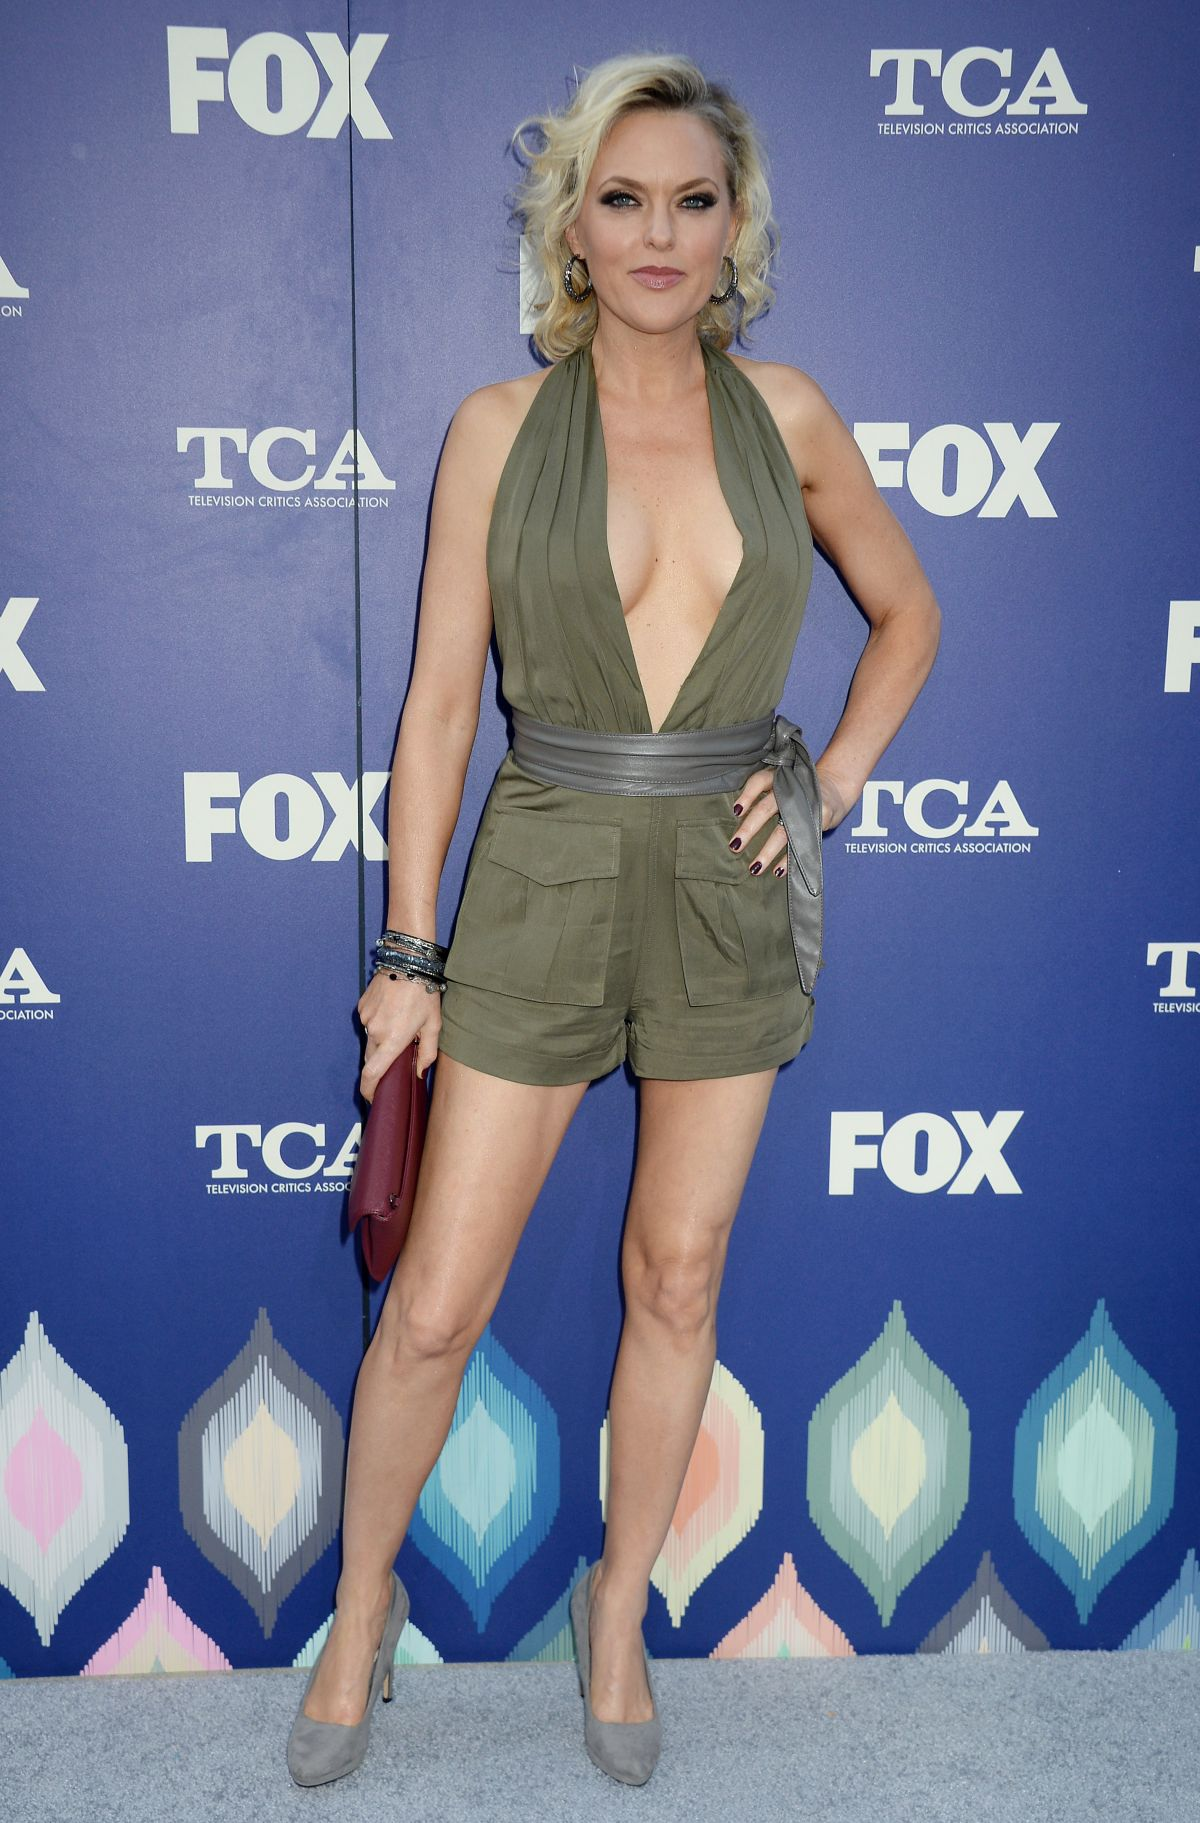 ELAINE HENDRIX at Fox Summer TCA All-star Party in West ...Elaine Hendrix Legs